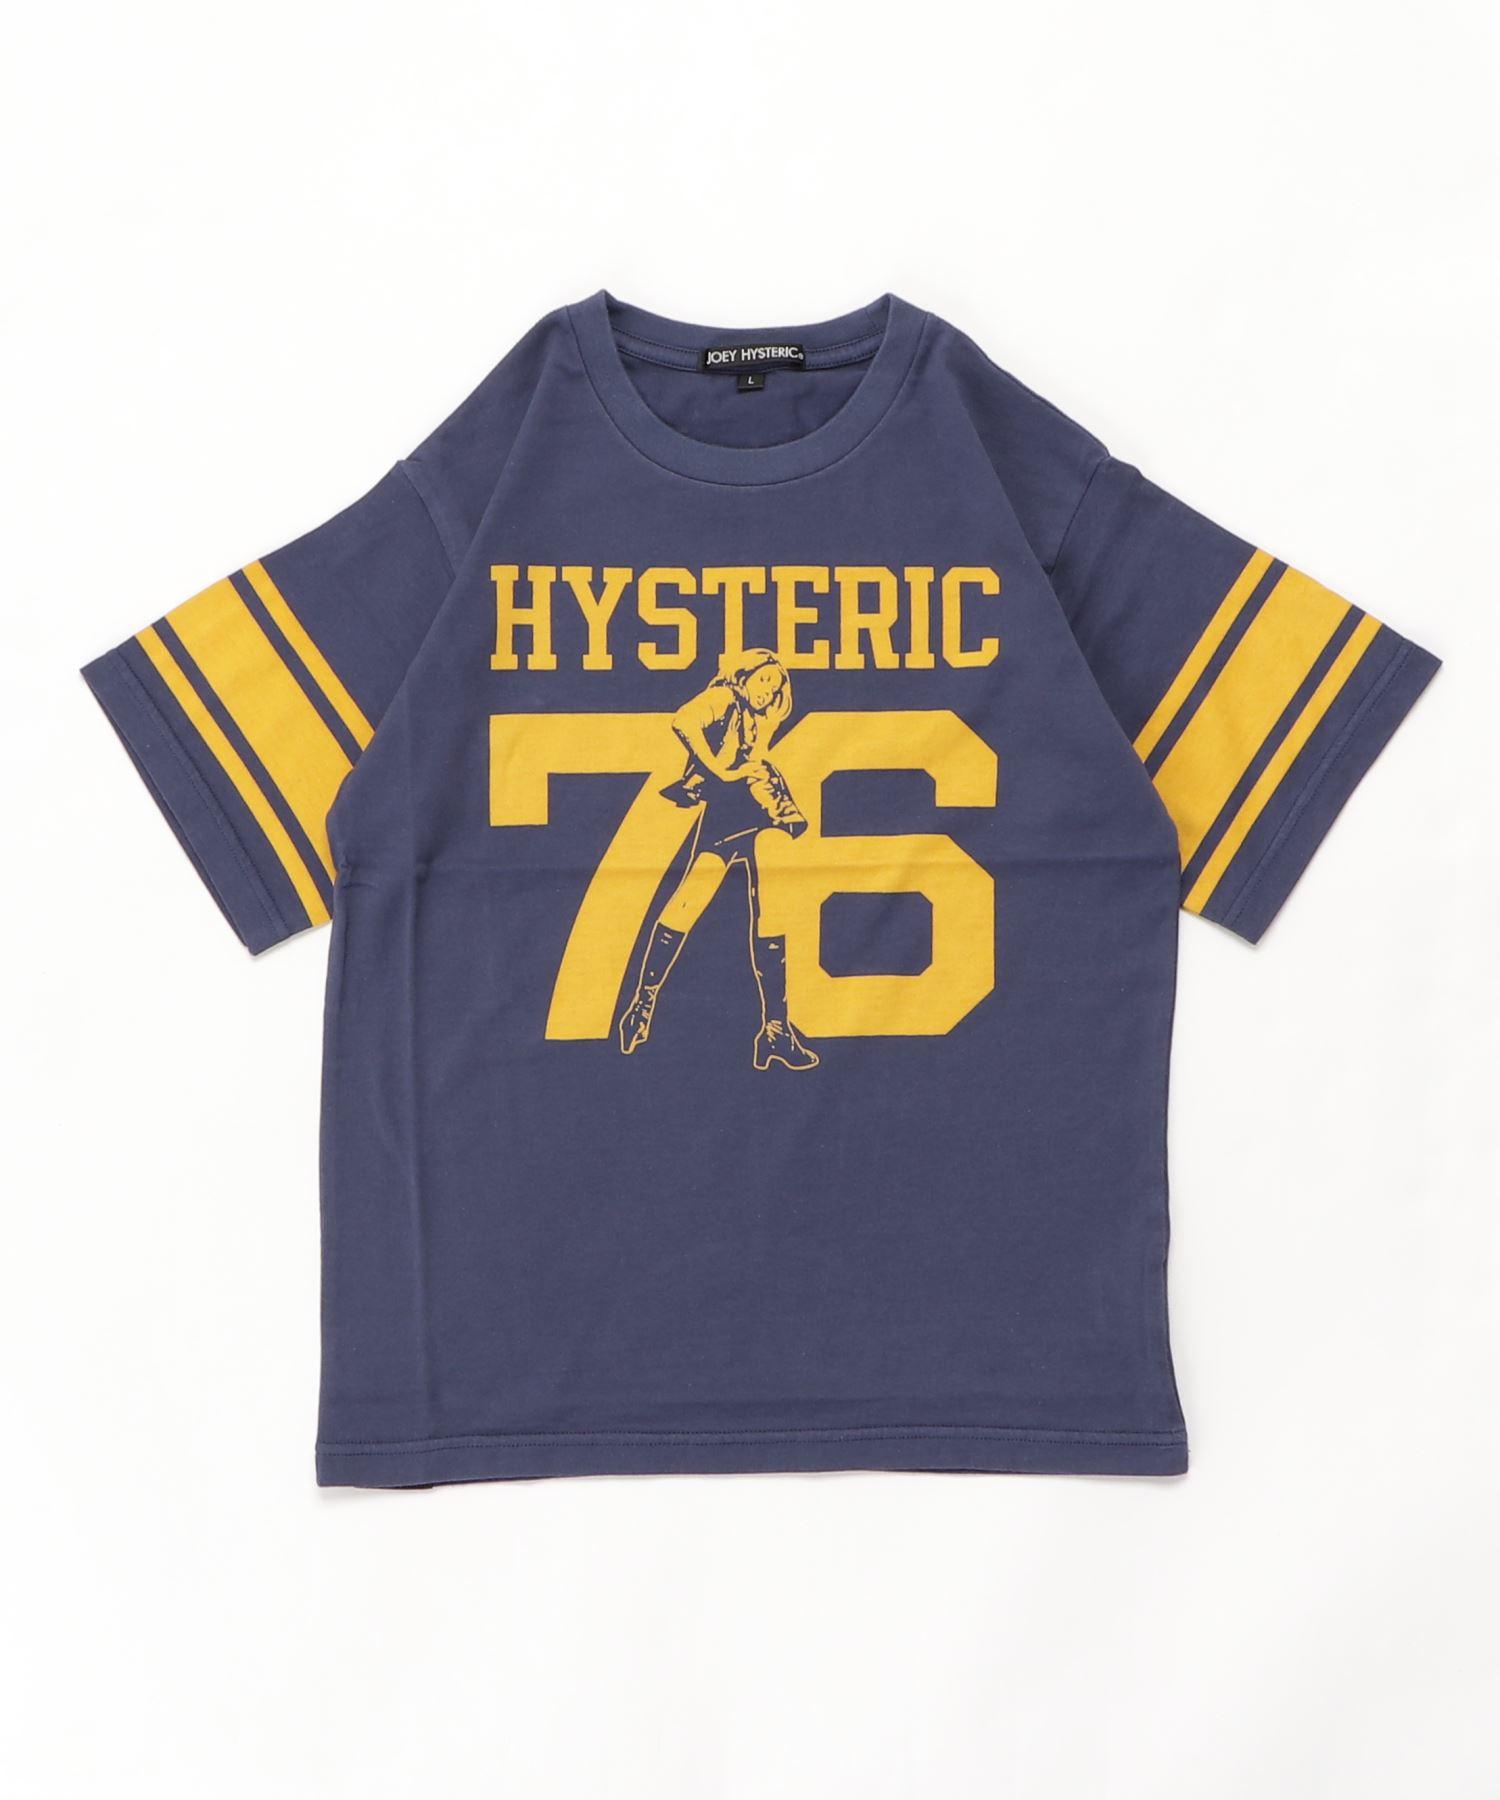 HYS 76 Tシャツ【L】